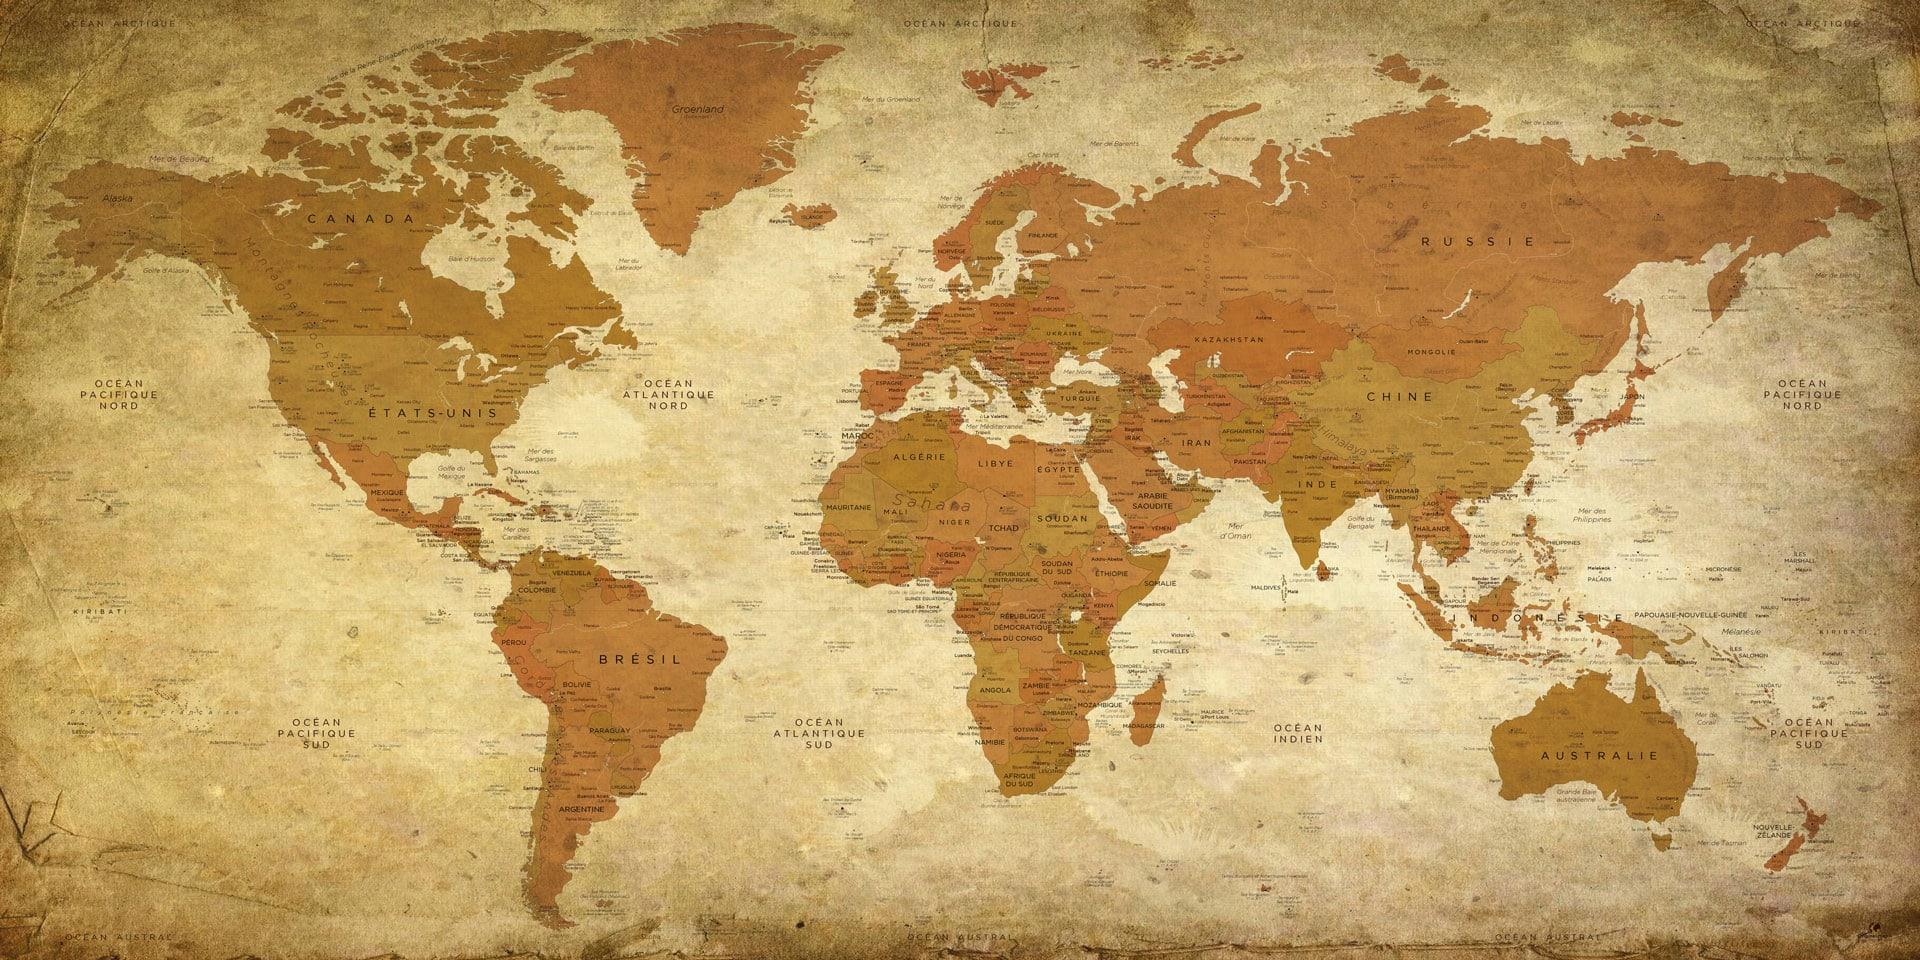 Carte Monde.Carte Monde Vintage Mappemonde Vintage Planisphere Vintage